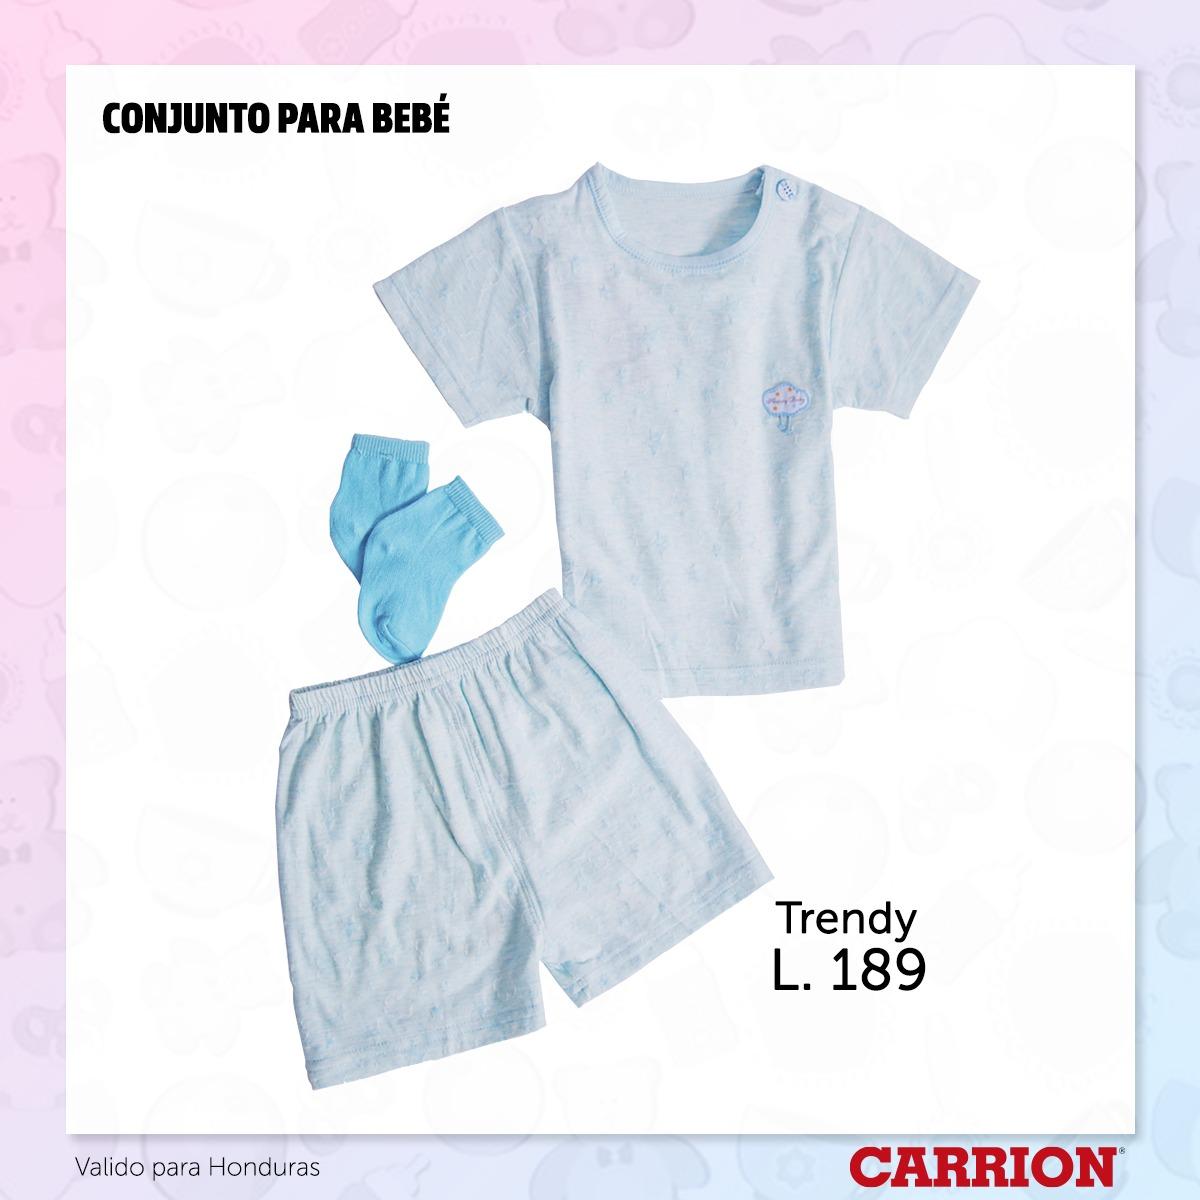 Conjunto frescos para tus bebés #tiendascarrion https://t.co/1i7HoG3Te8